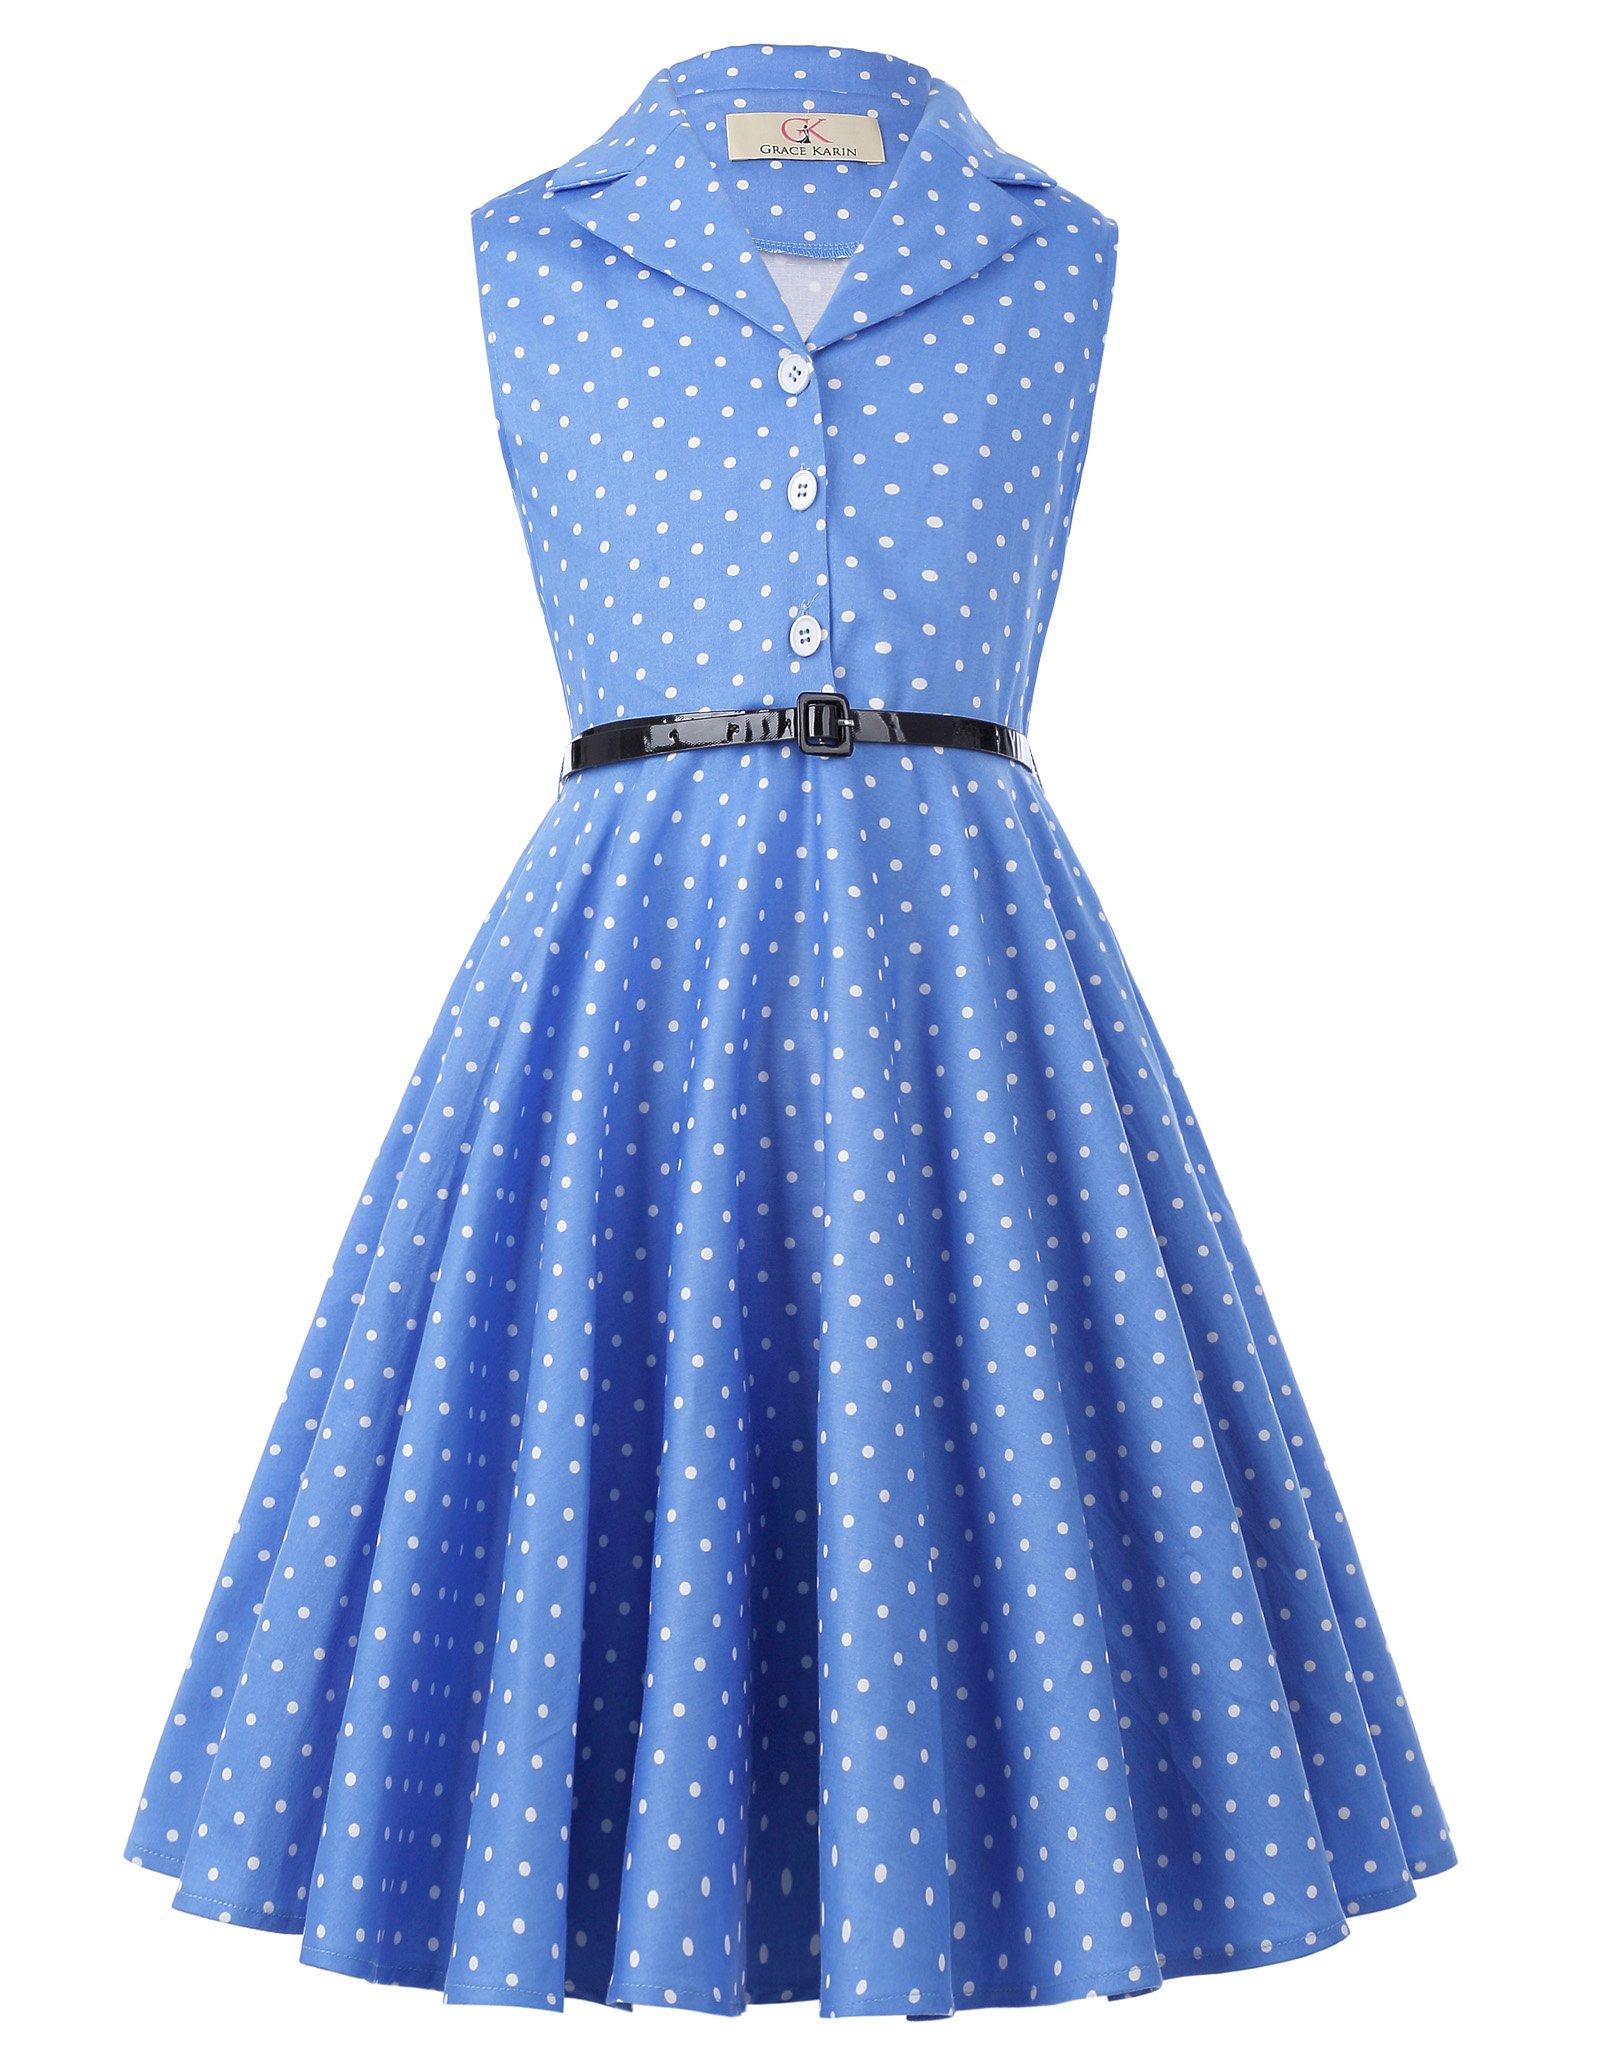 Polk Dot Girl Sleeveless Vintage Print Casual Dresses 11yrs CL9000-4